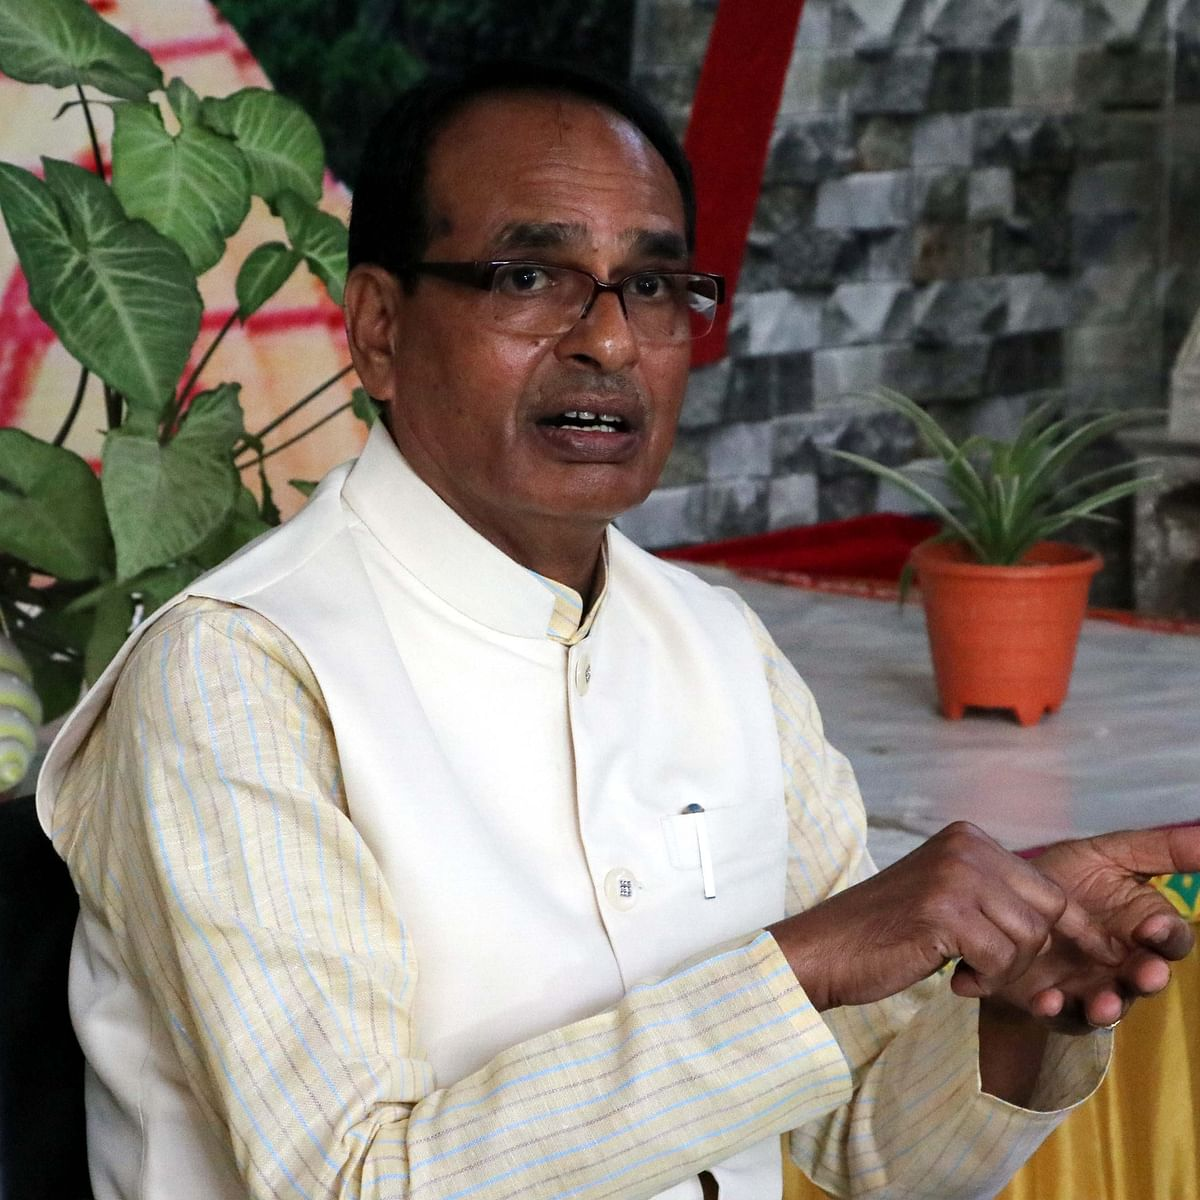 Indore stone pelting: CM Shivraj Singh Chouhan appreciates sherni doctors, calls them real McCoy